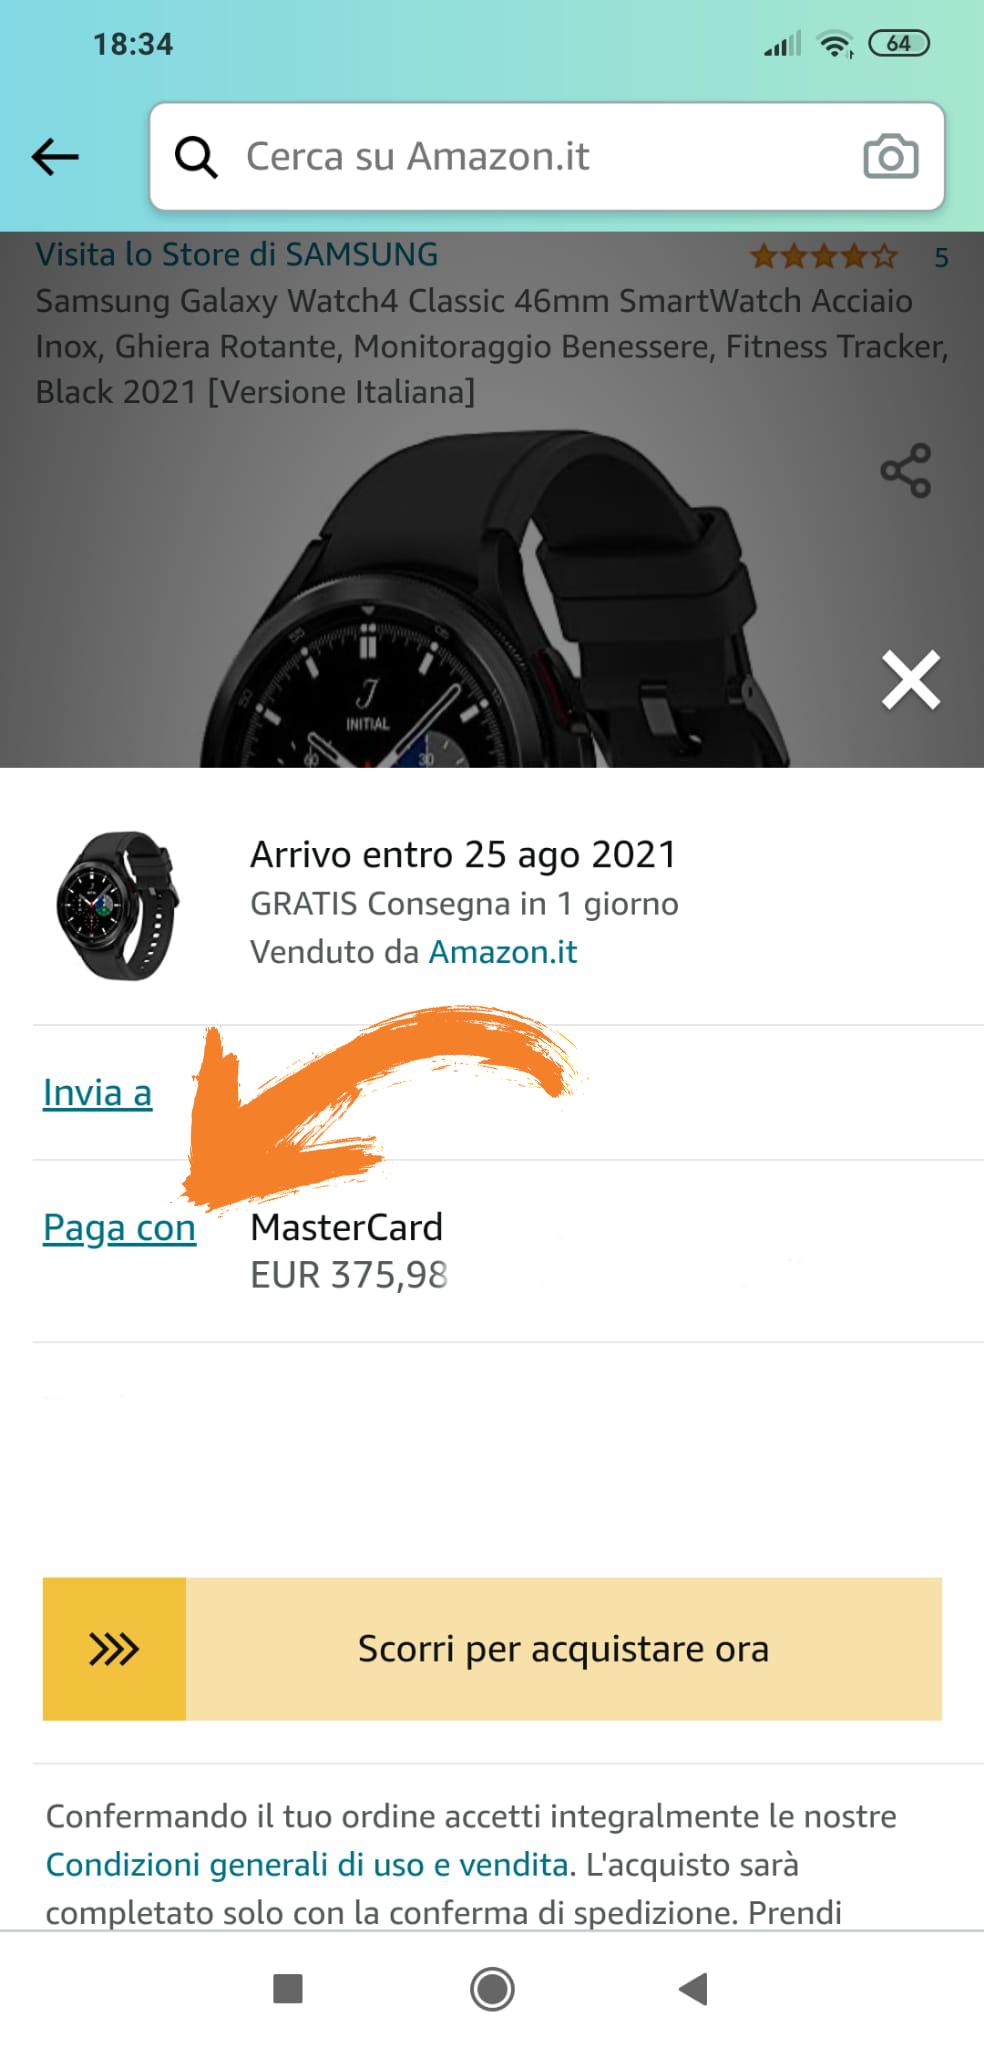 4 come applicare codice sconto su amazon, samsung galaxy watch4